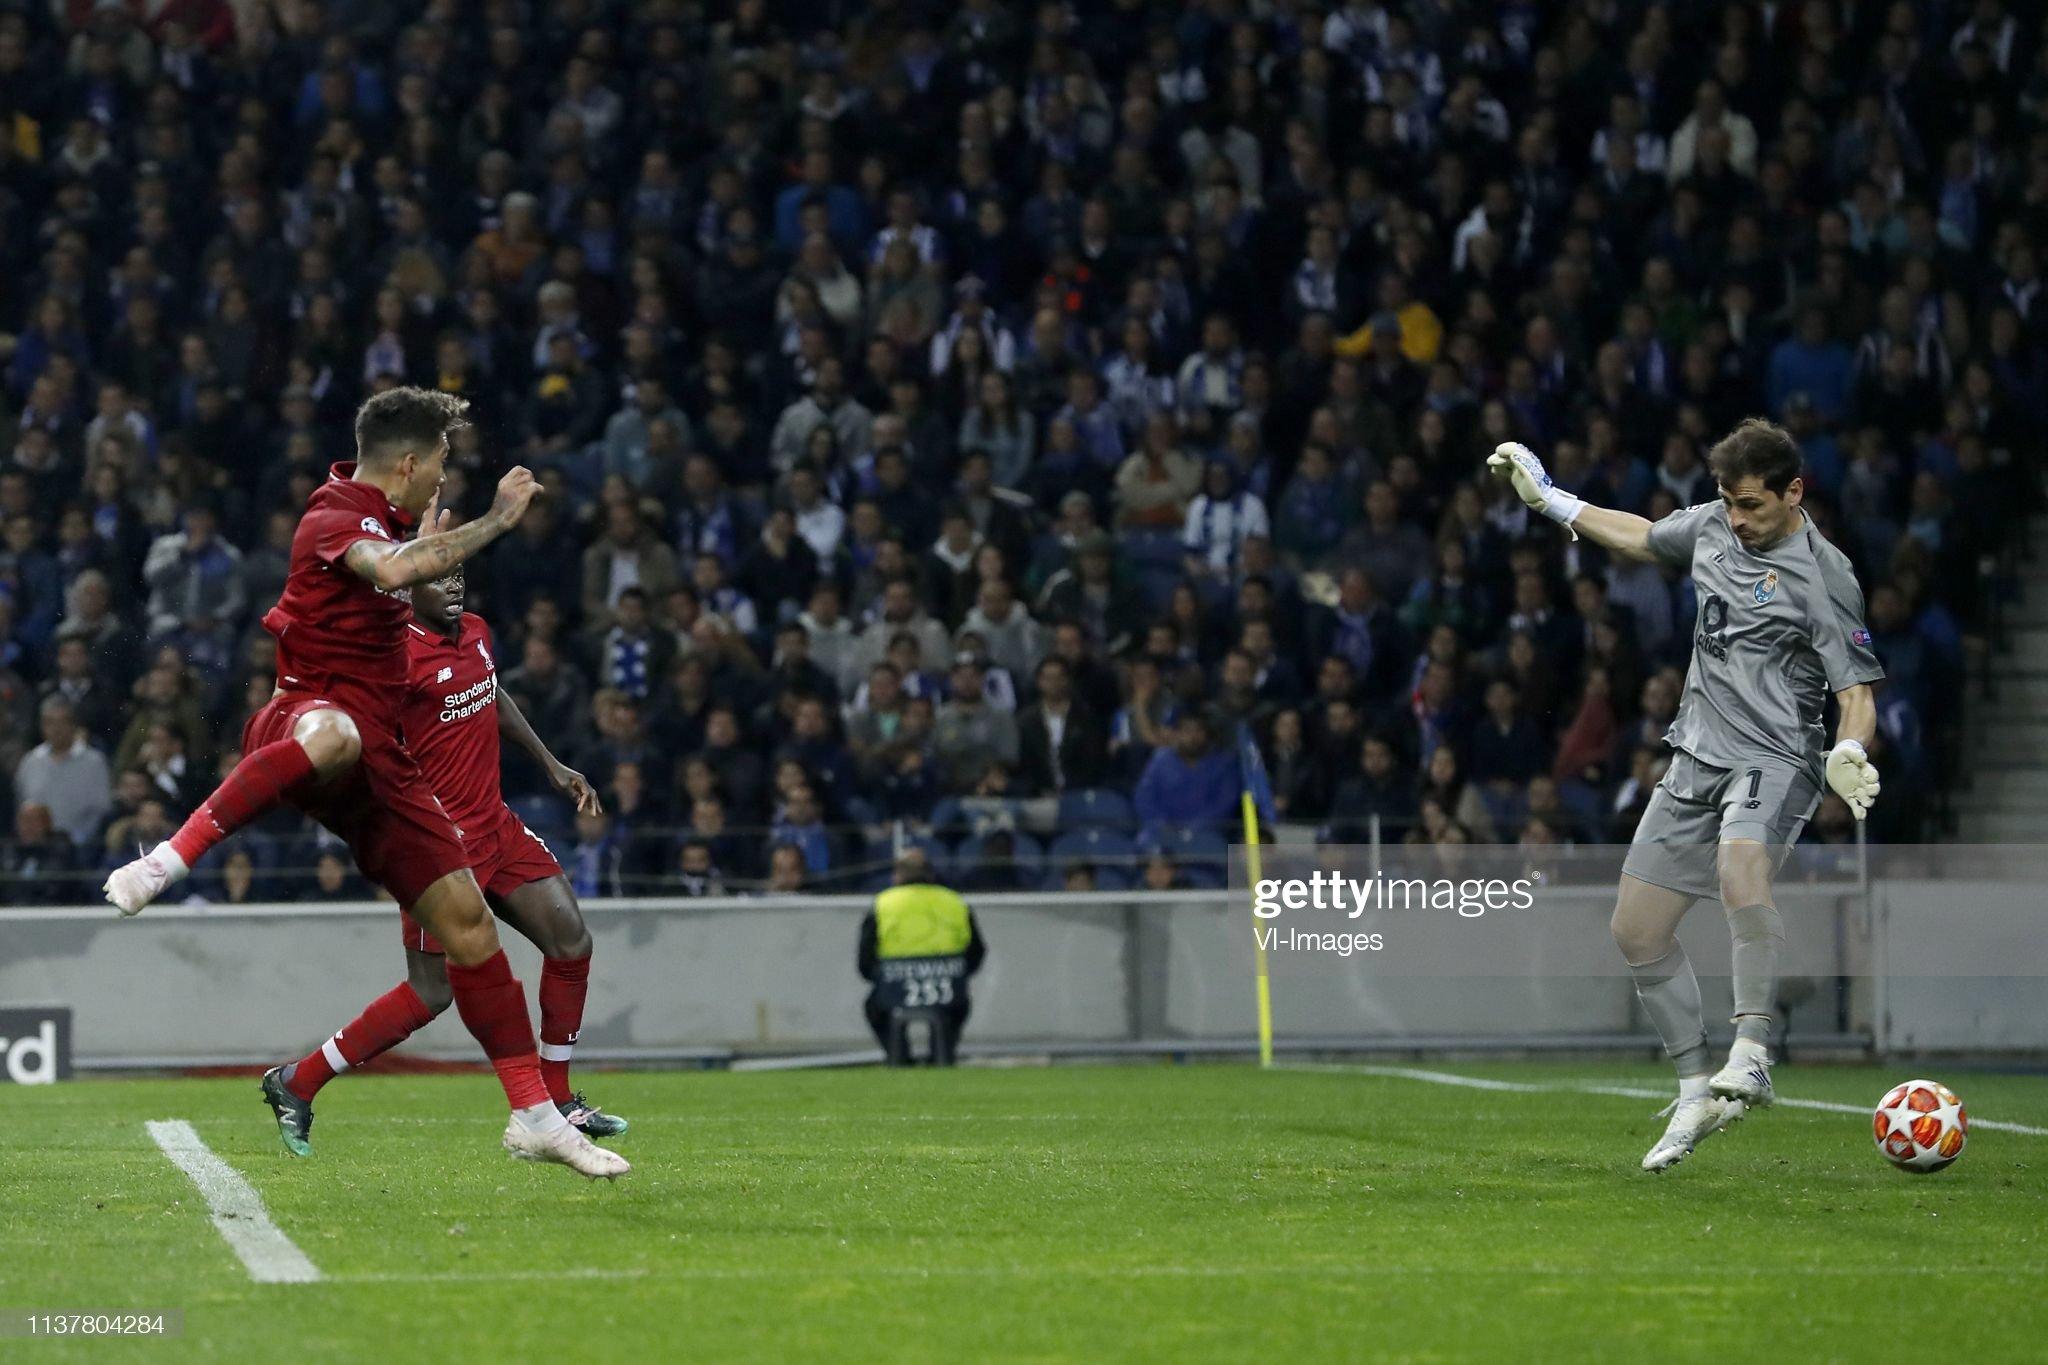 UEFA Champions League'FC Porto v Liverpool FC' : News Photo